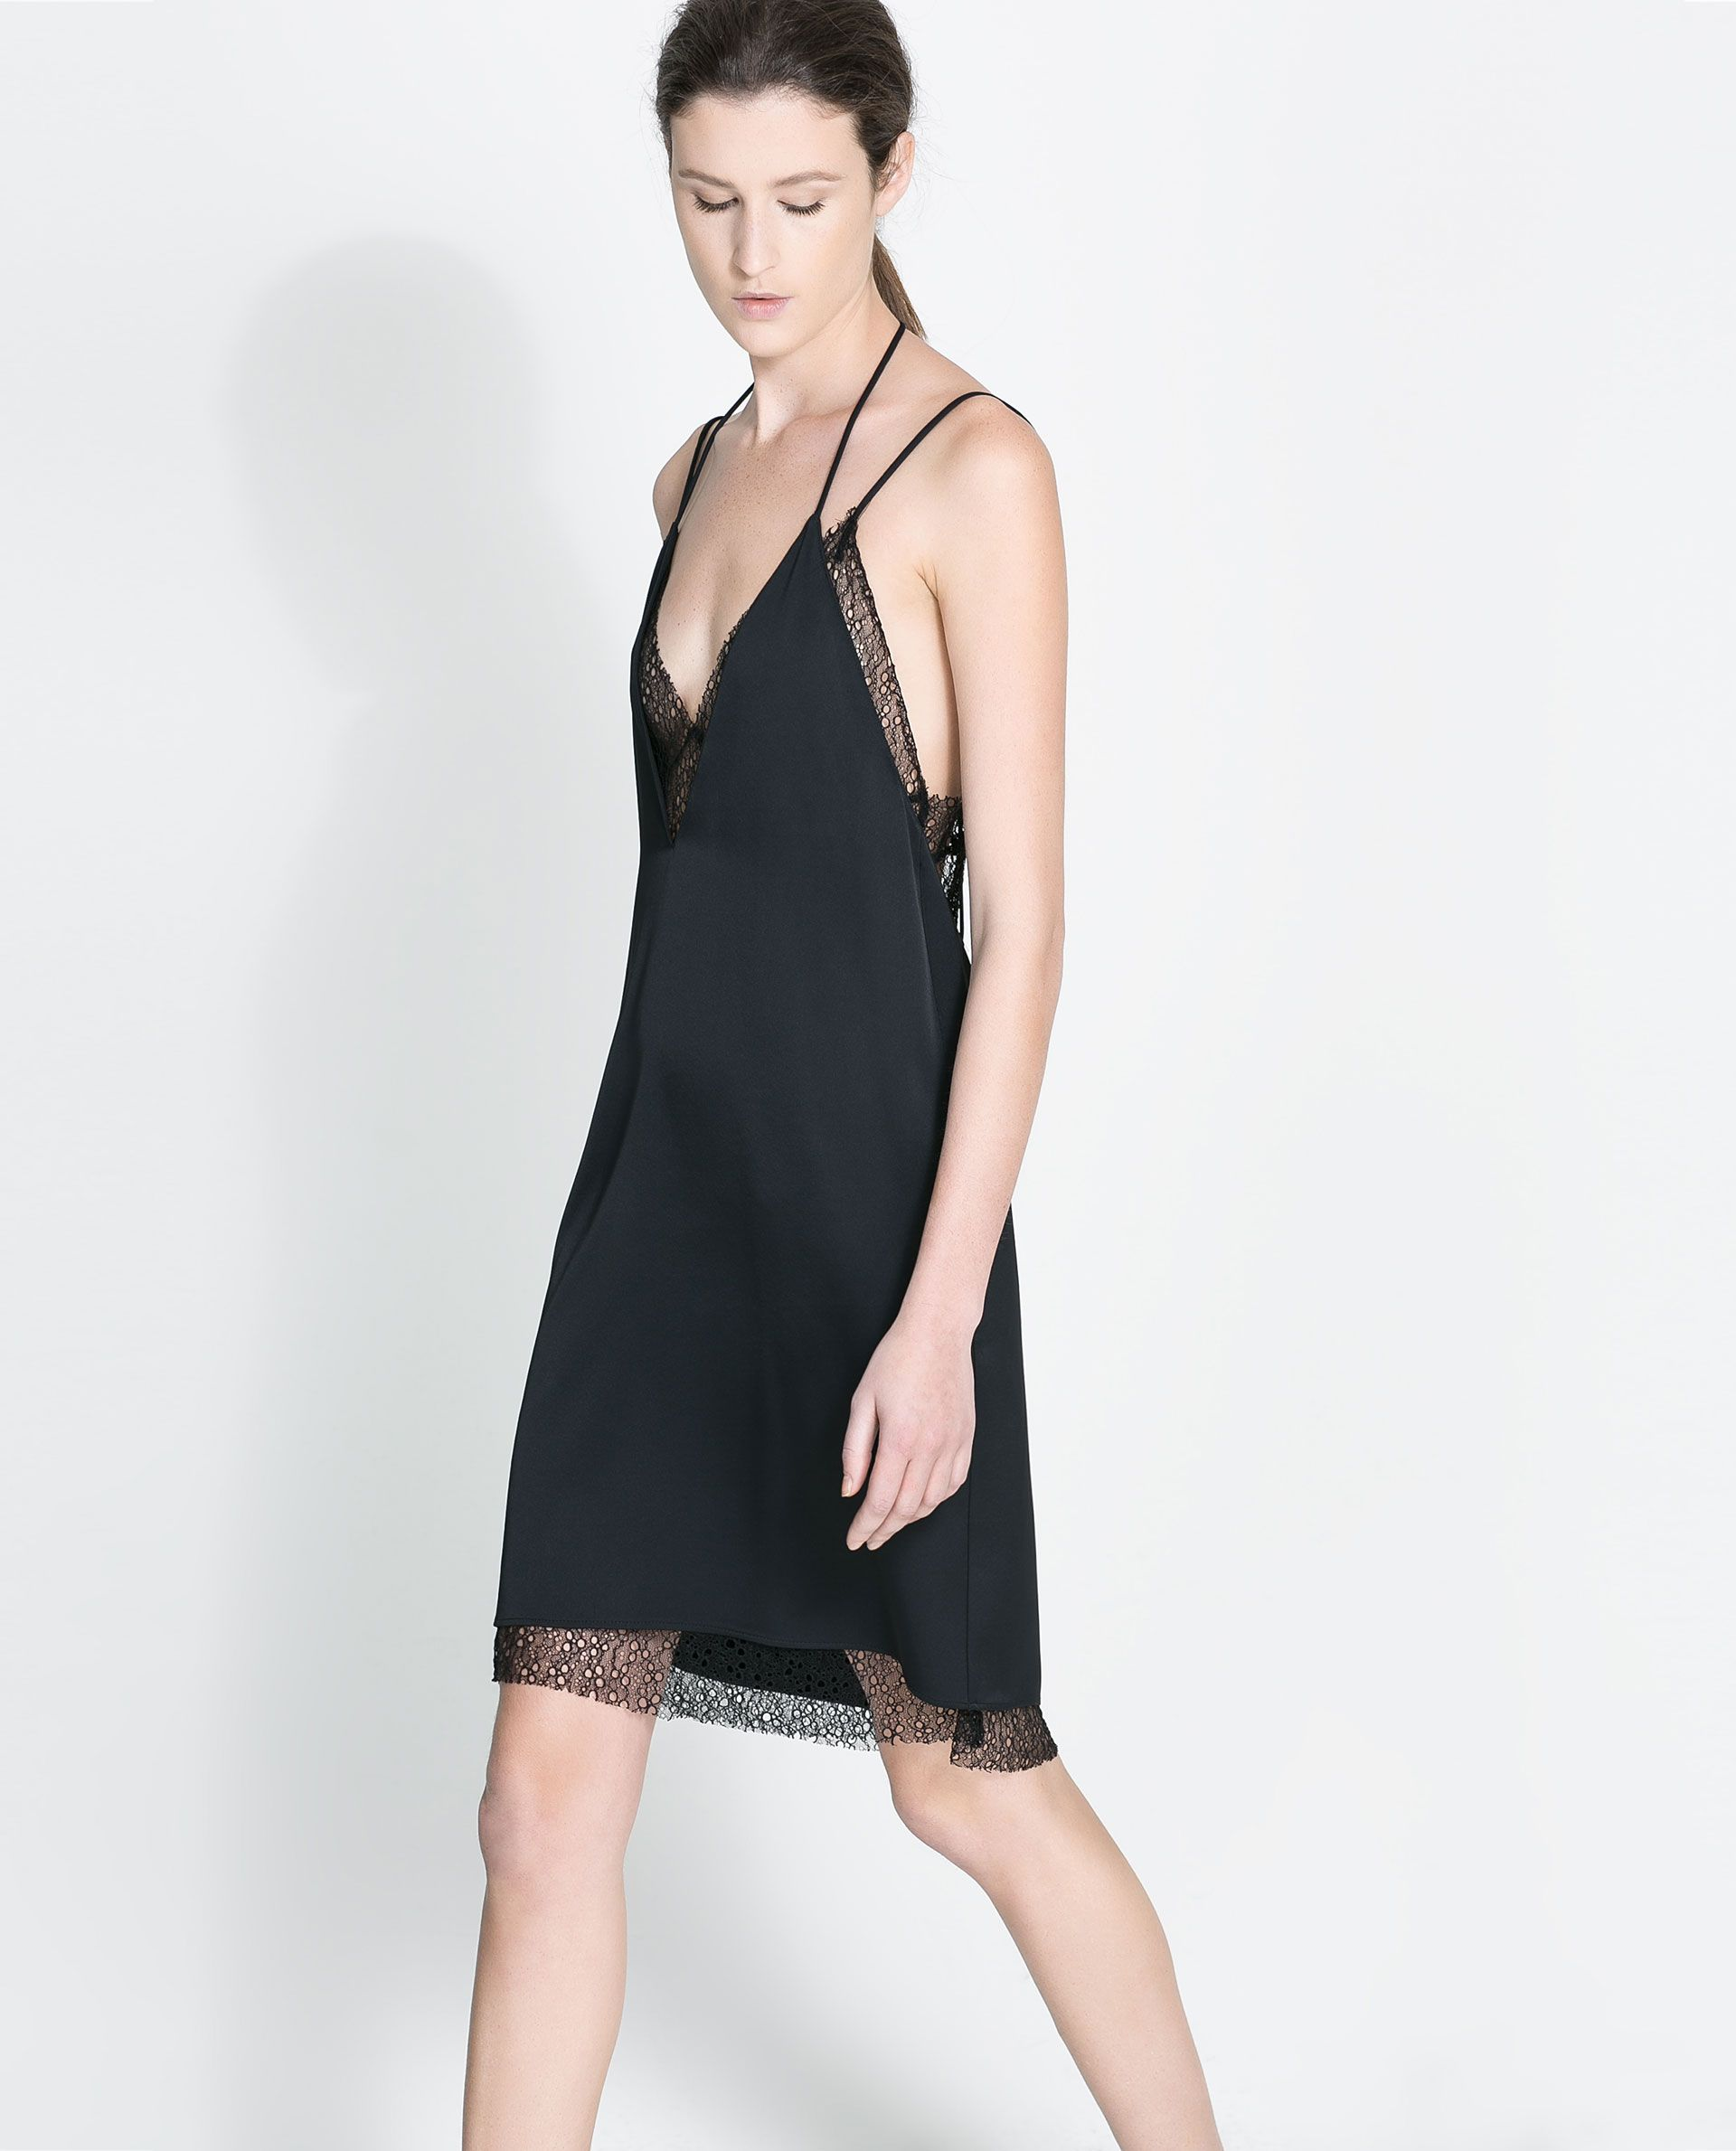 ZARA - WOMAN - STUDIO MESH DRESS | dress ME | Pinterest